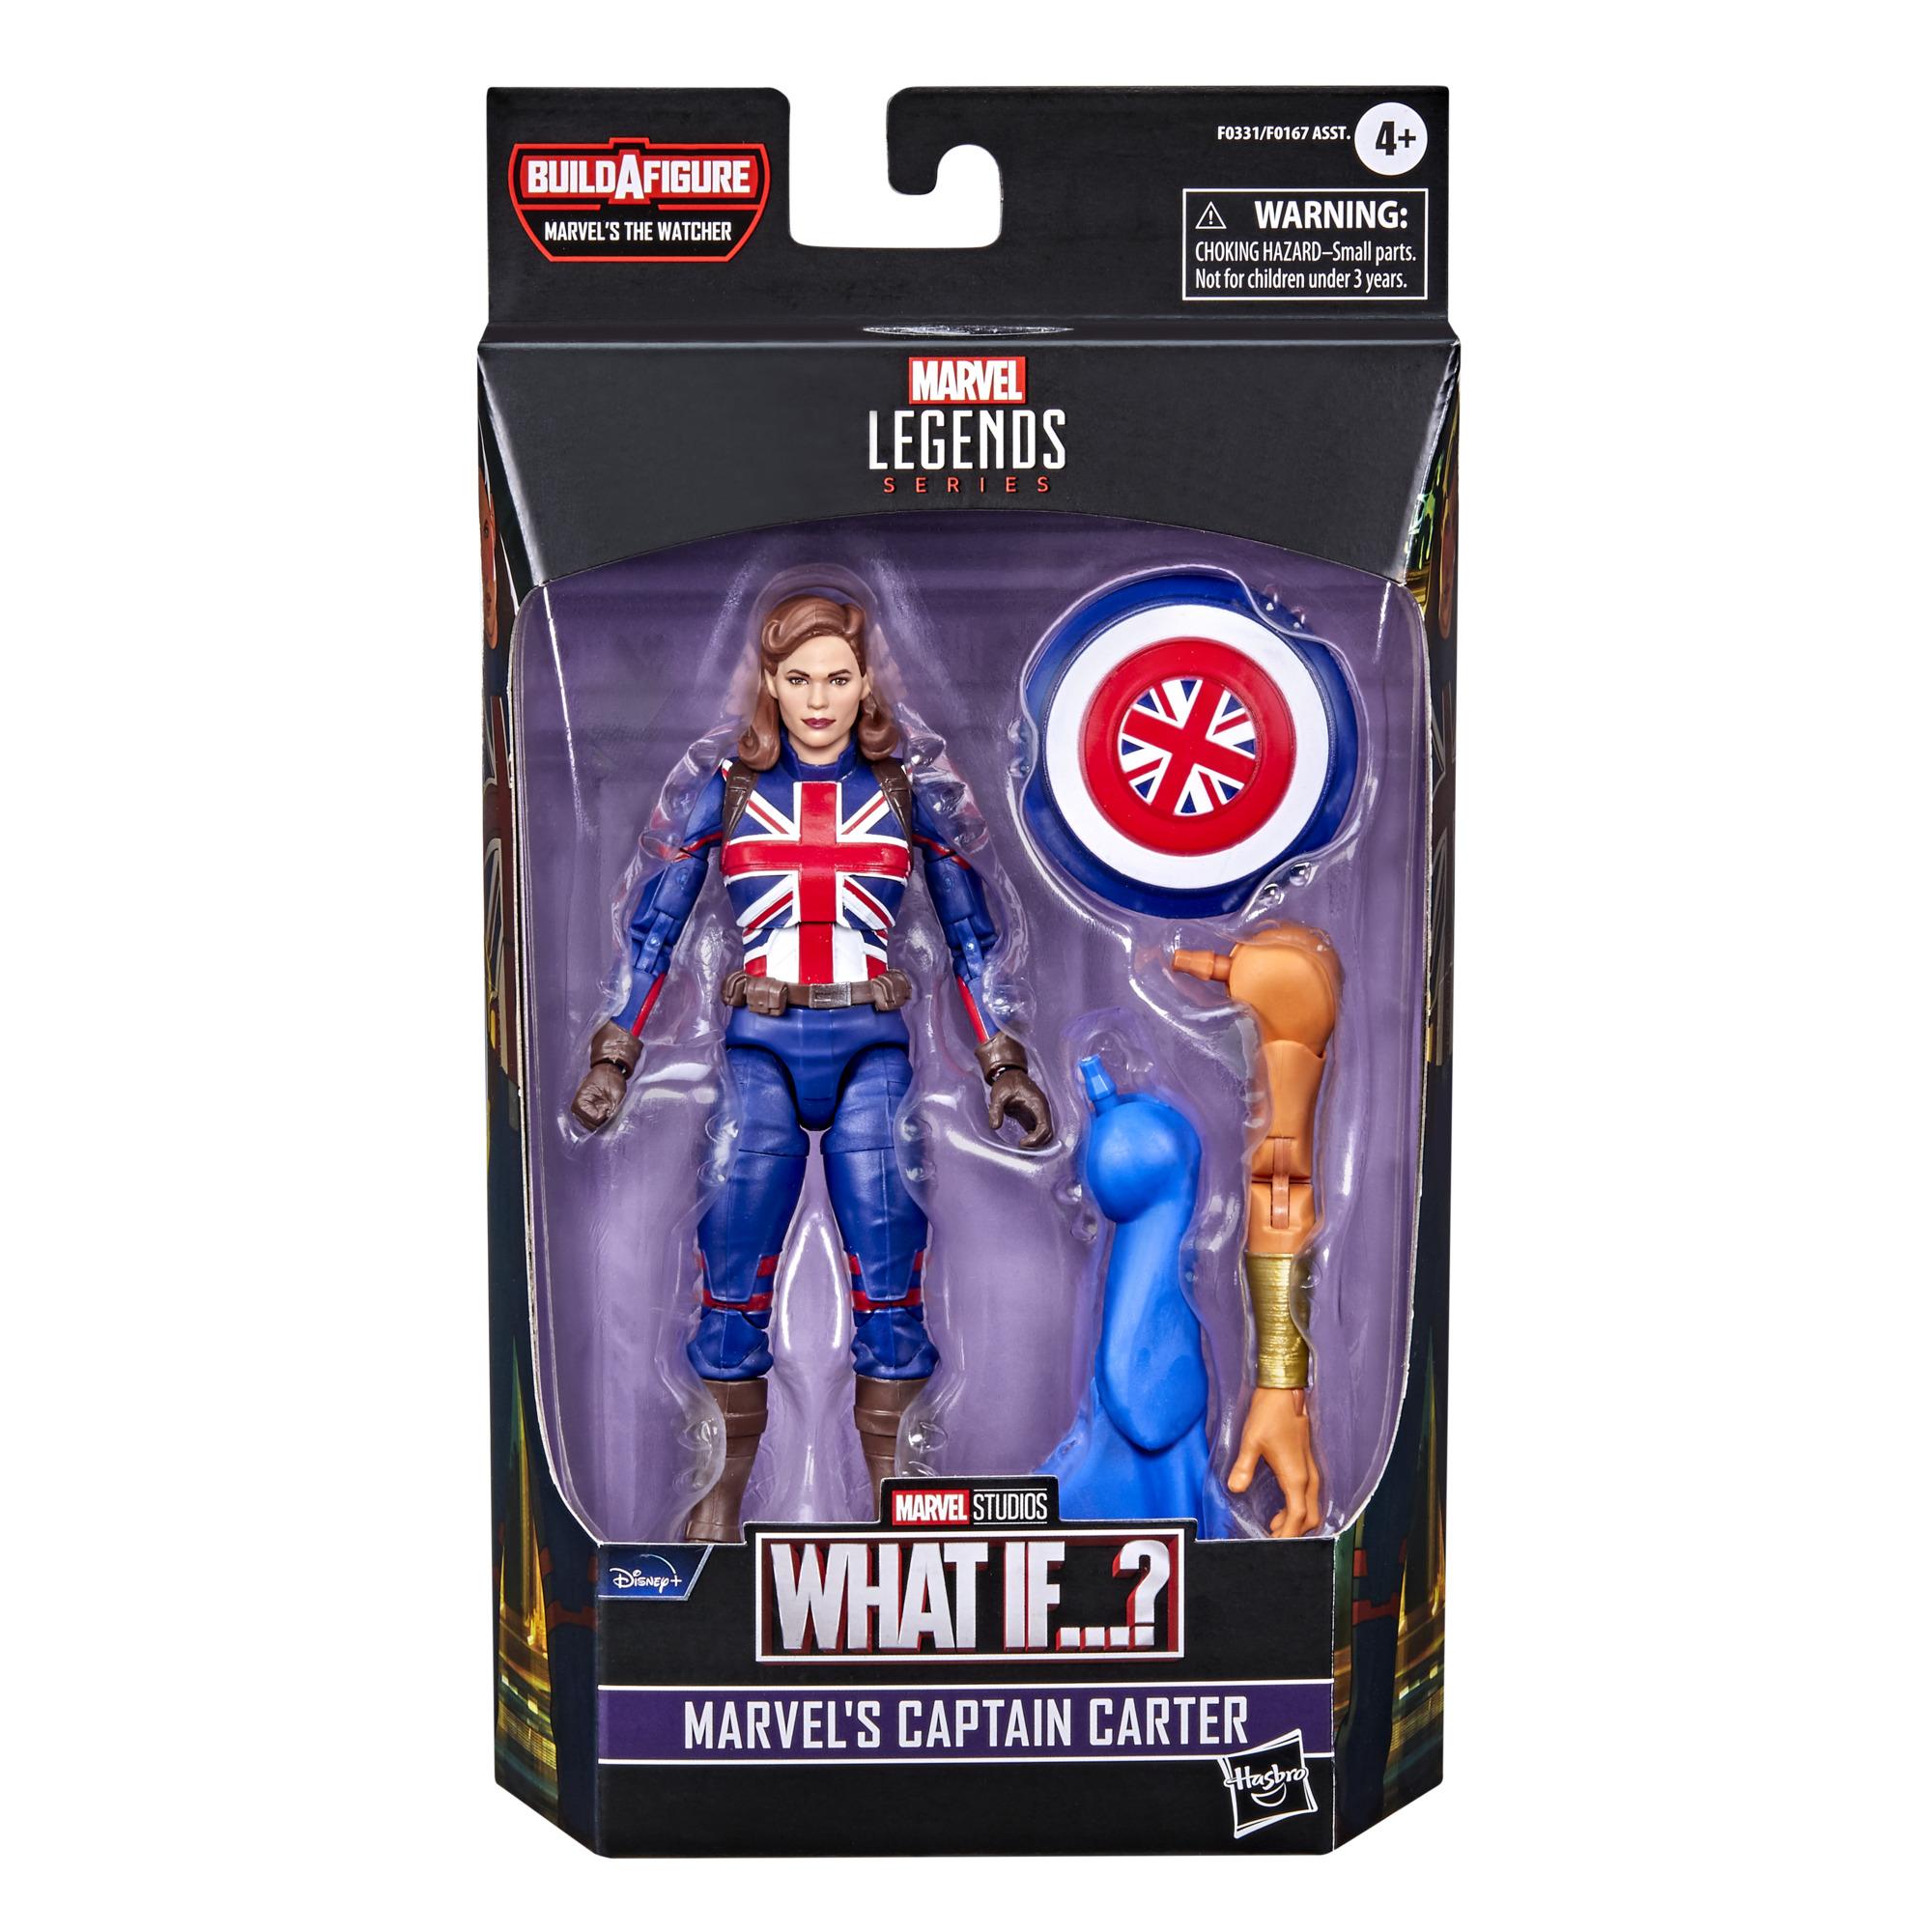 Marvel Legends Series Marvel's Captain Carter